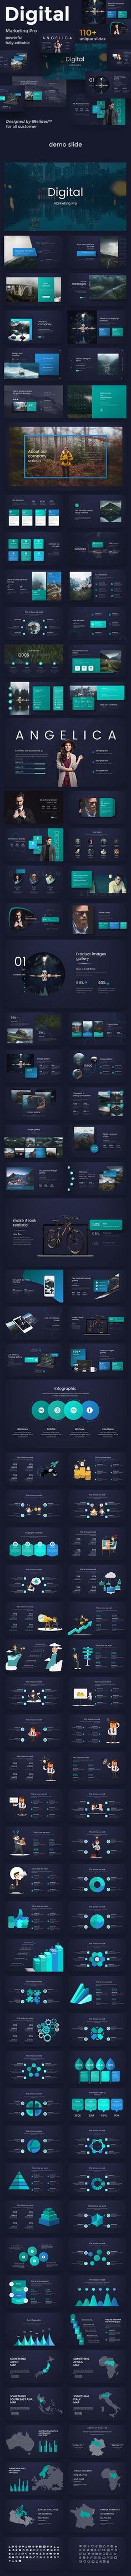 Digital Marketing Pro Design Keynote Template — Keynote KEY #profile #modern • Download ➝ https://graphicriver.net/item/digital-marketing-pro-design-keynote-template/21754183?ref=pxcr